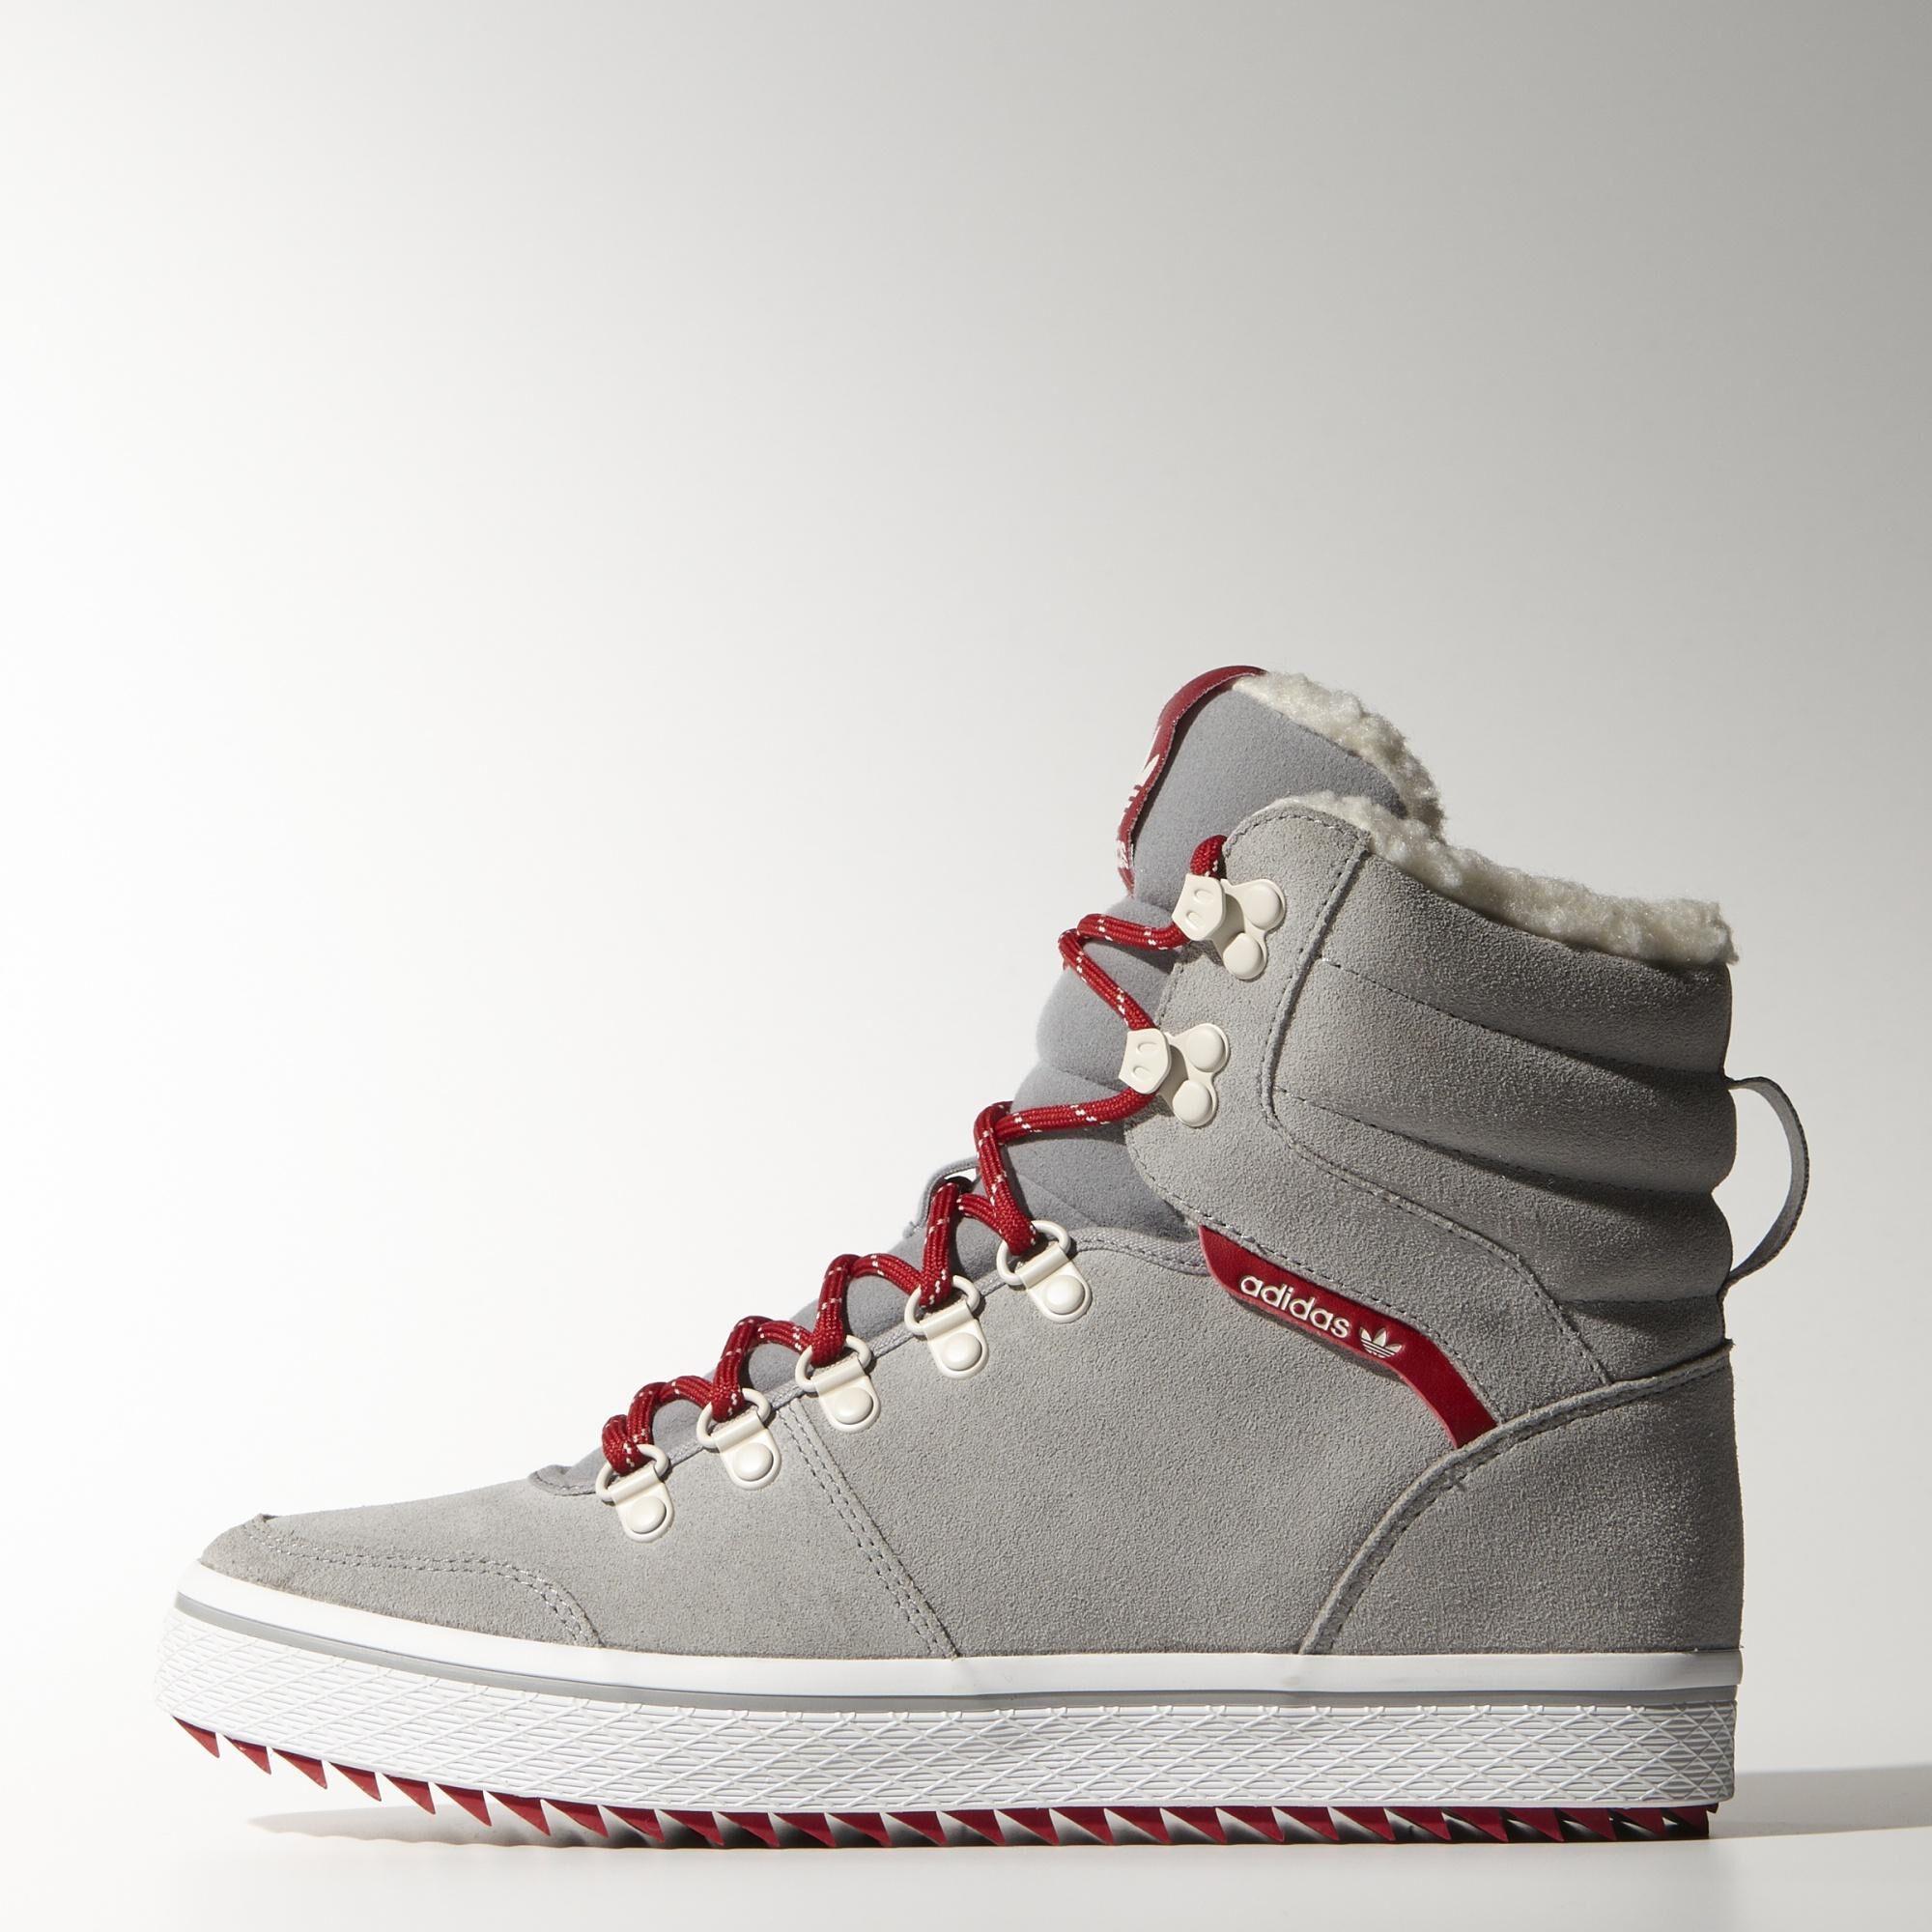 adidas , Zapatillas Honey Hill Caña Alta Mujer Light Onix / Power Red / White M20763